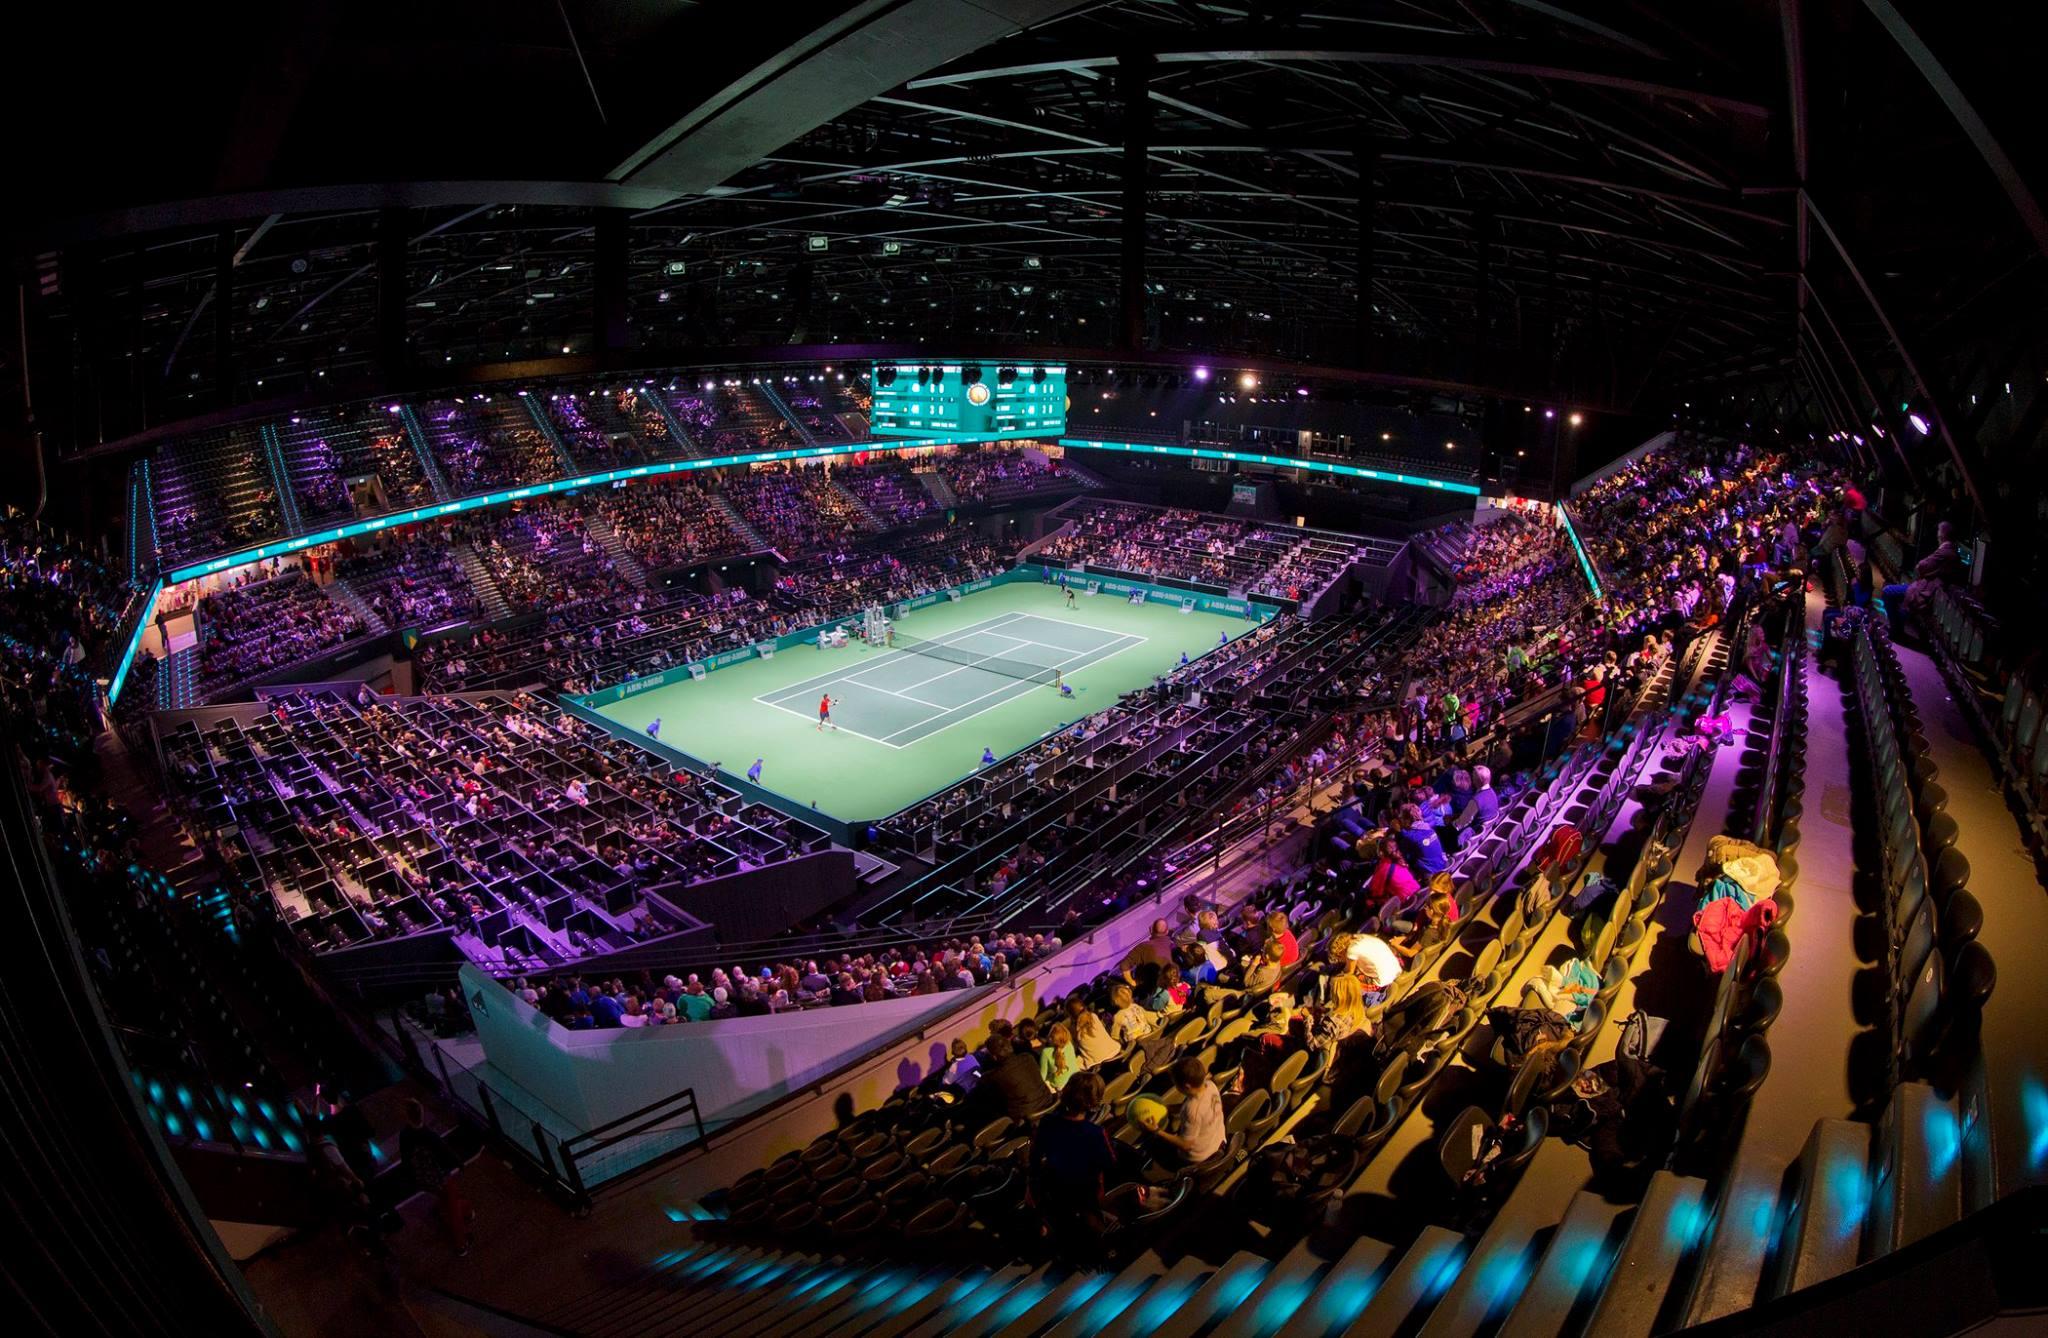 ABN AMRO Tennis Tournament Rotterdam - Daily Cappuccino - Lifestyle blog